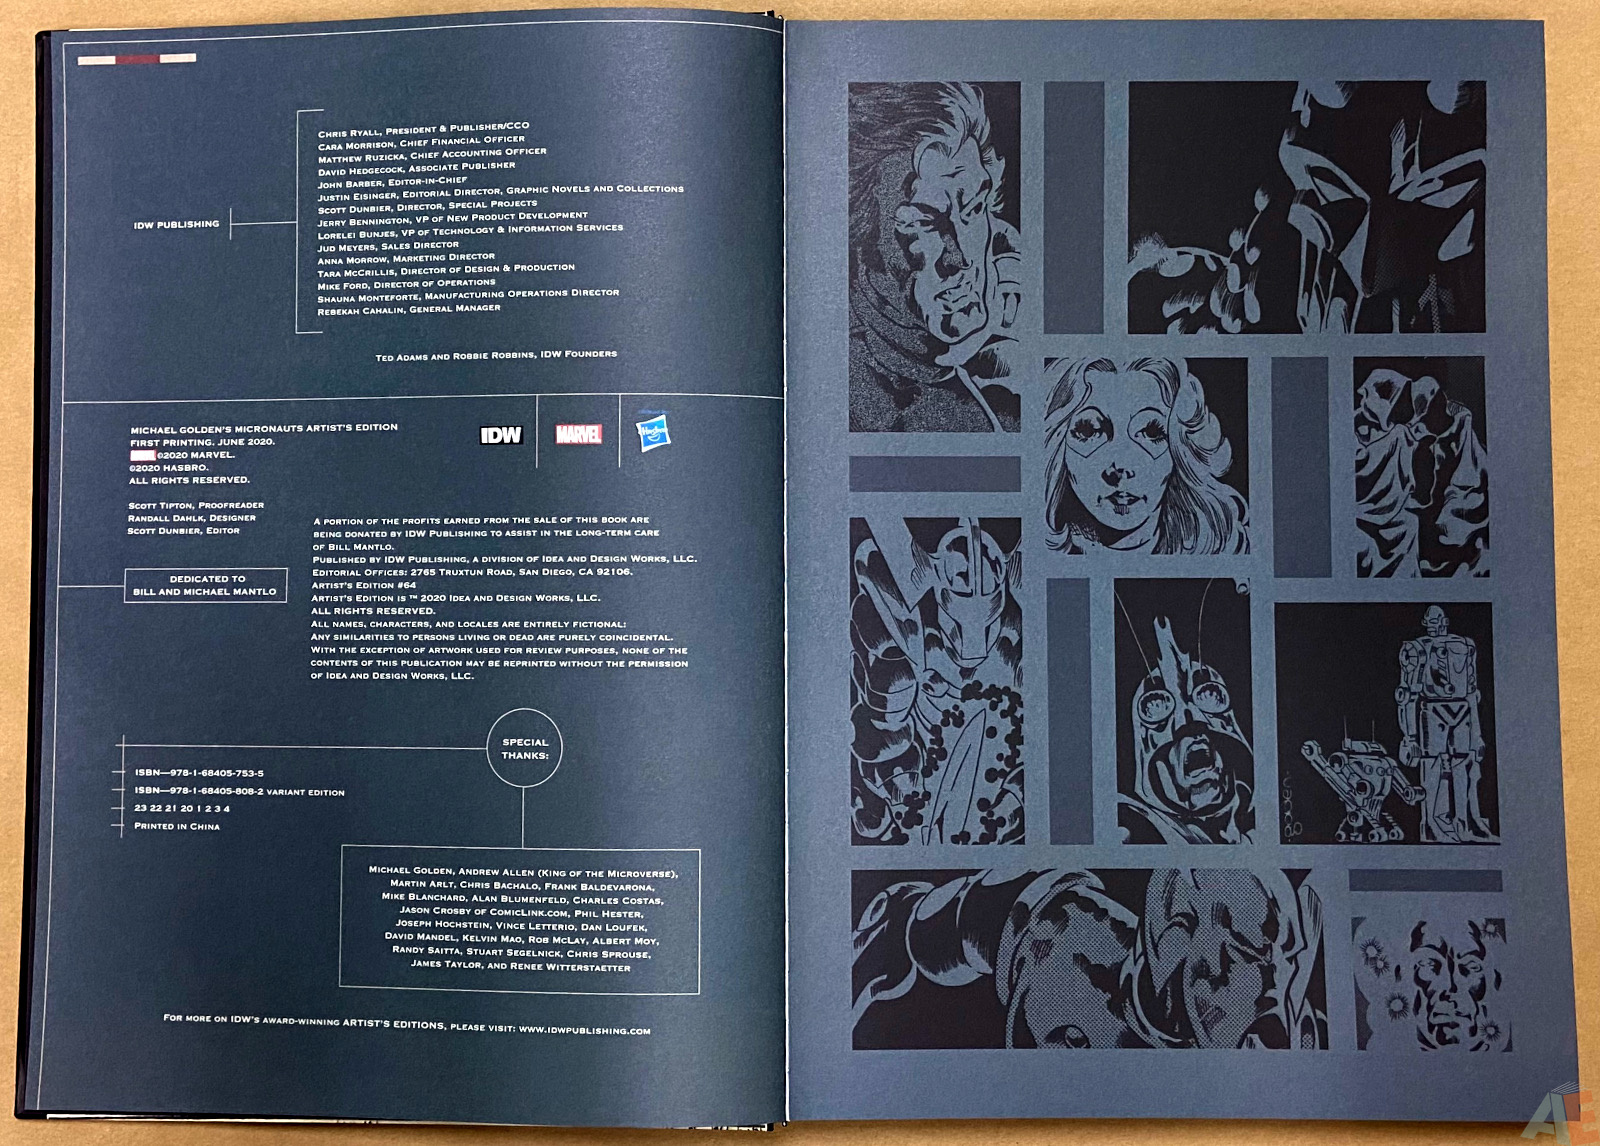 Michael Goldens Micronauts Artists Edition interior 1